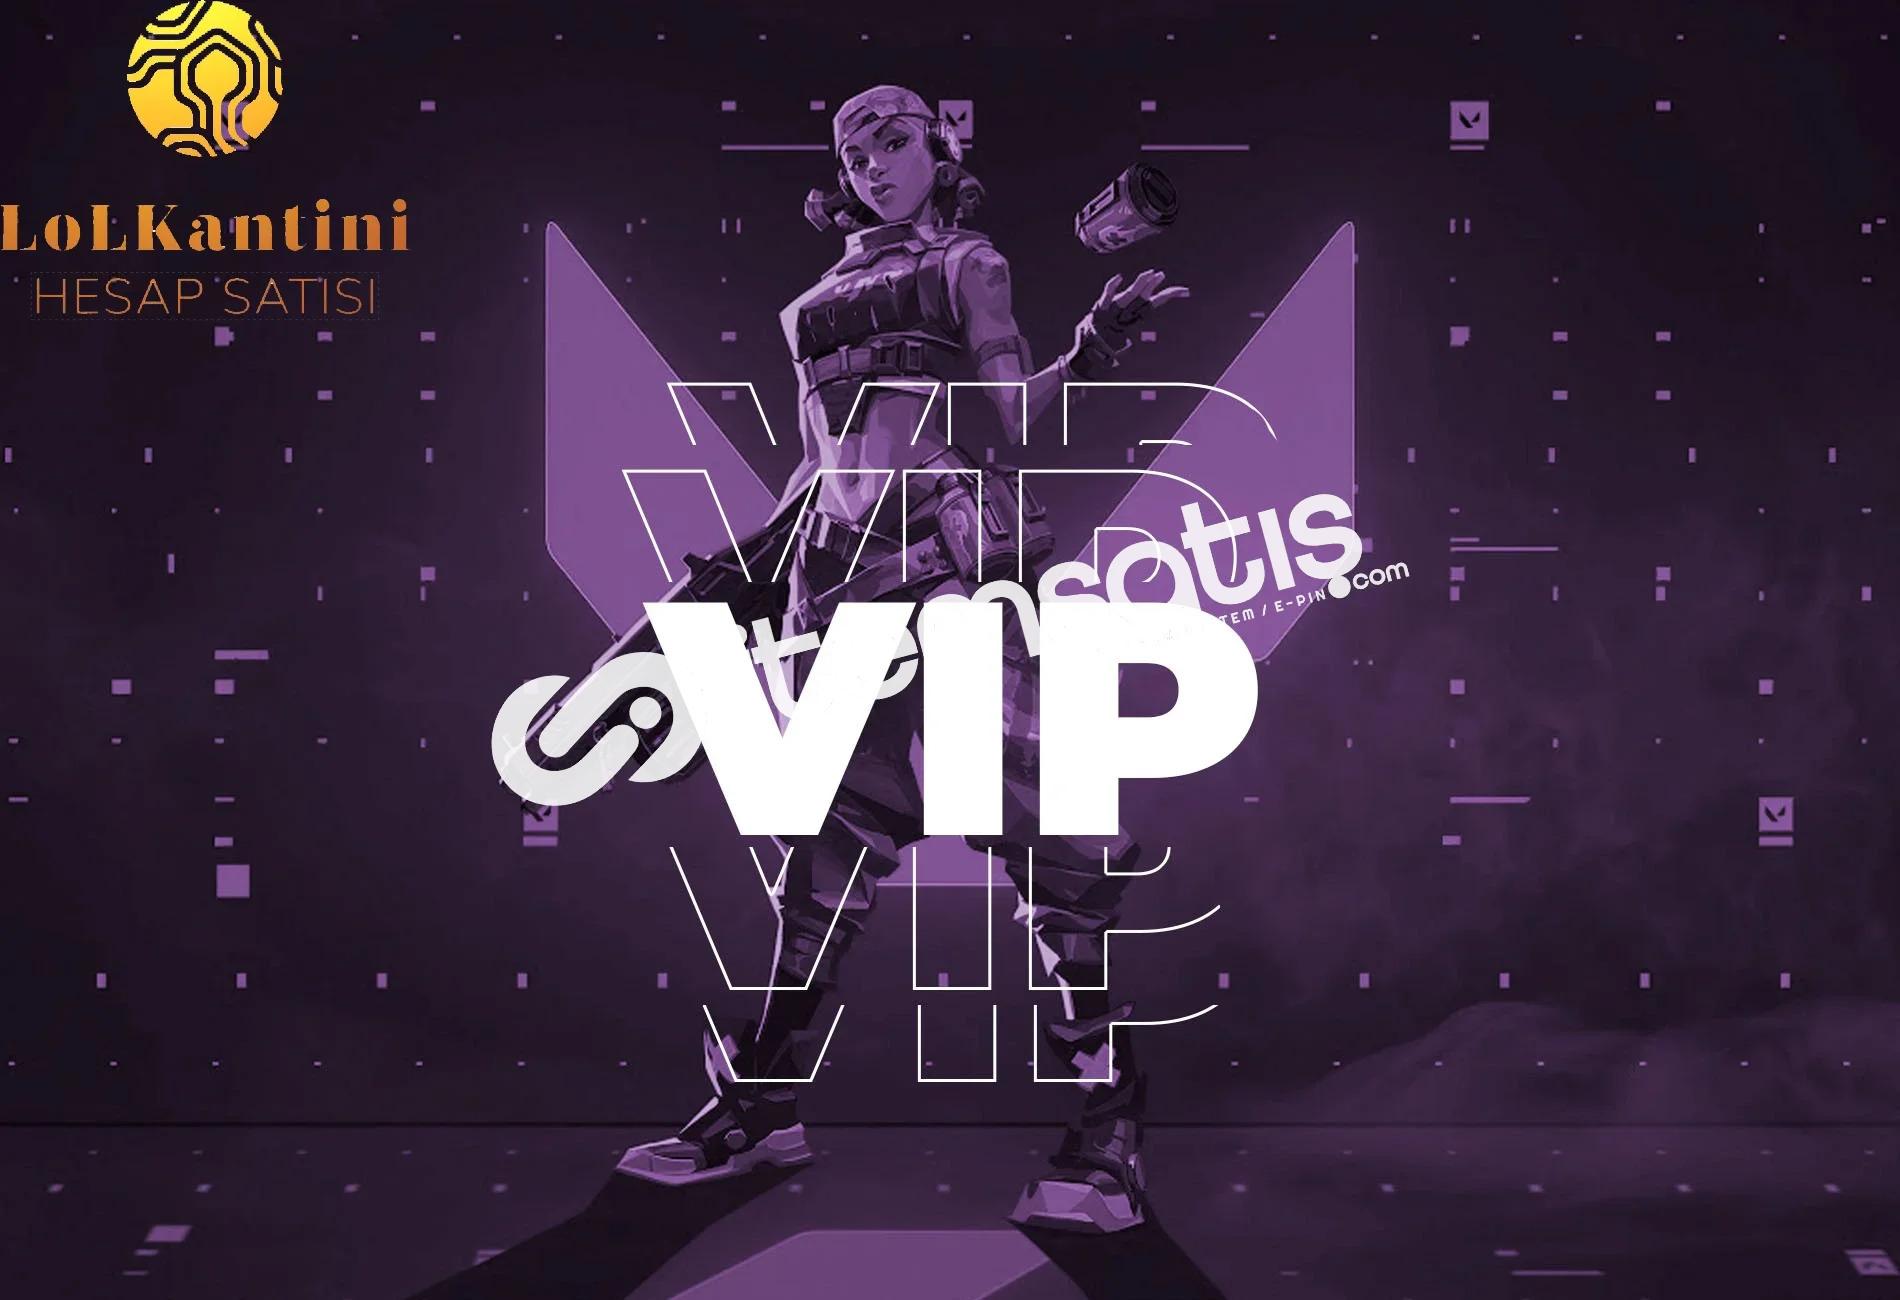 VIP l 30-149 SKIN ARASI EN KALİTELİ RANDOM HESAPLAR